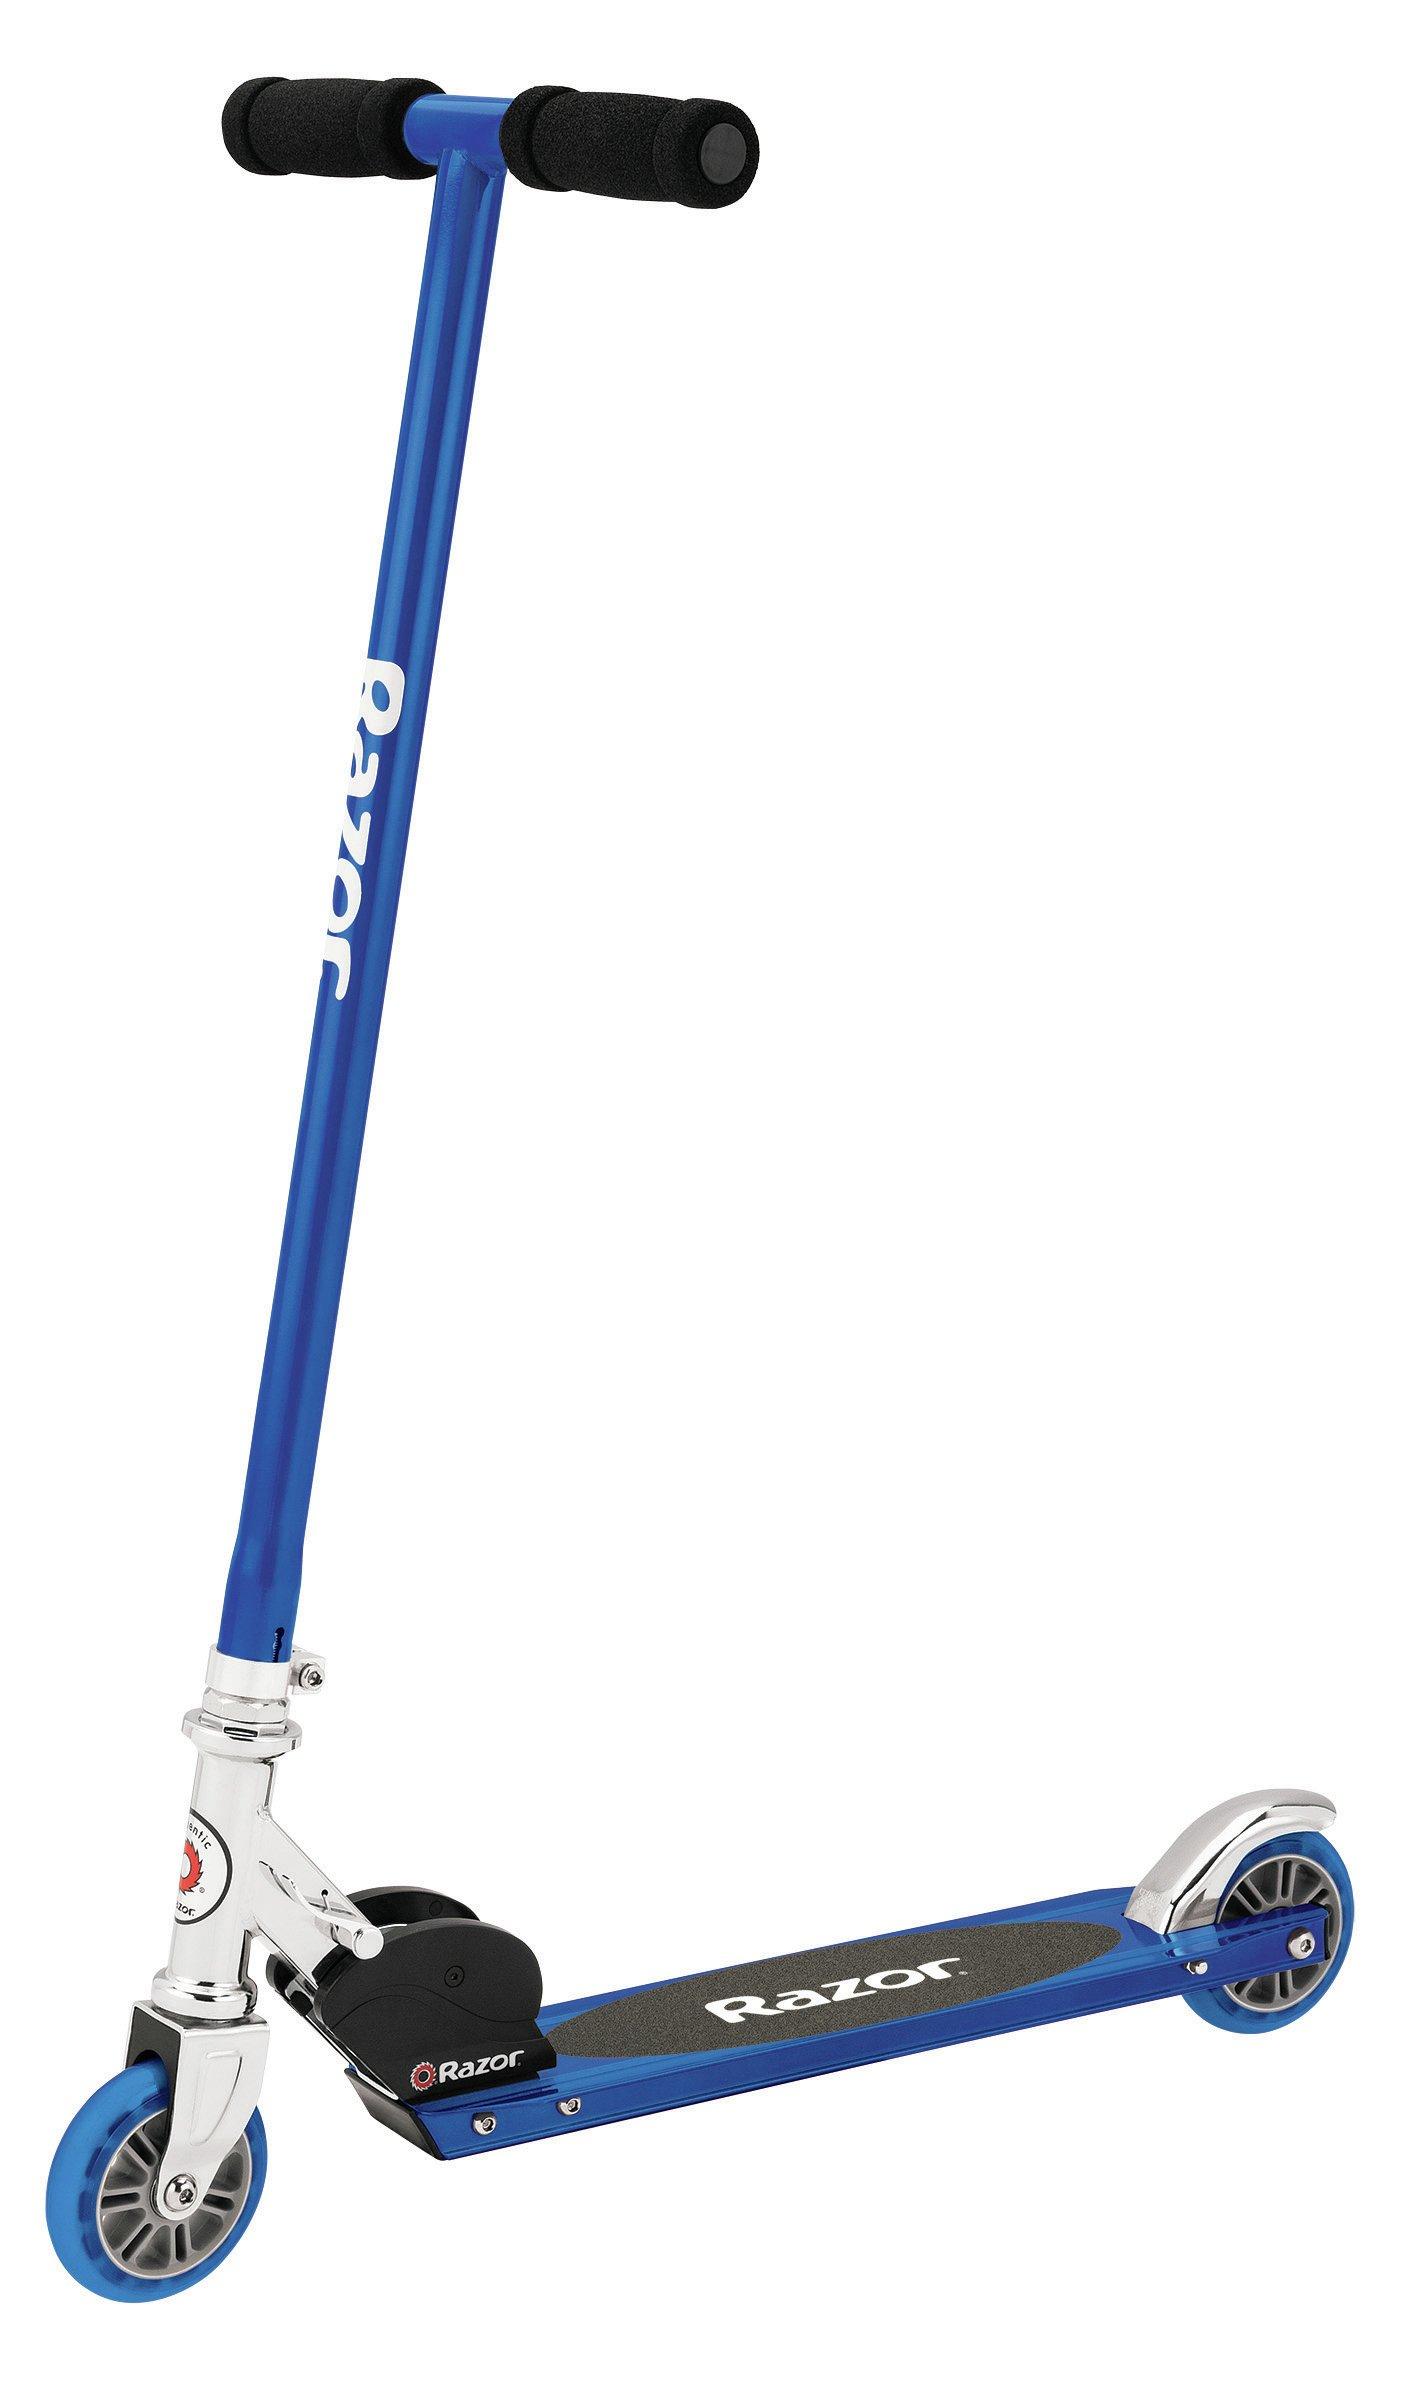 Razor - S Sport - Scooter - Blue